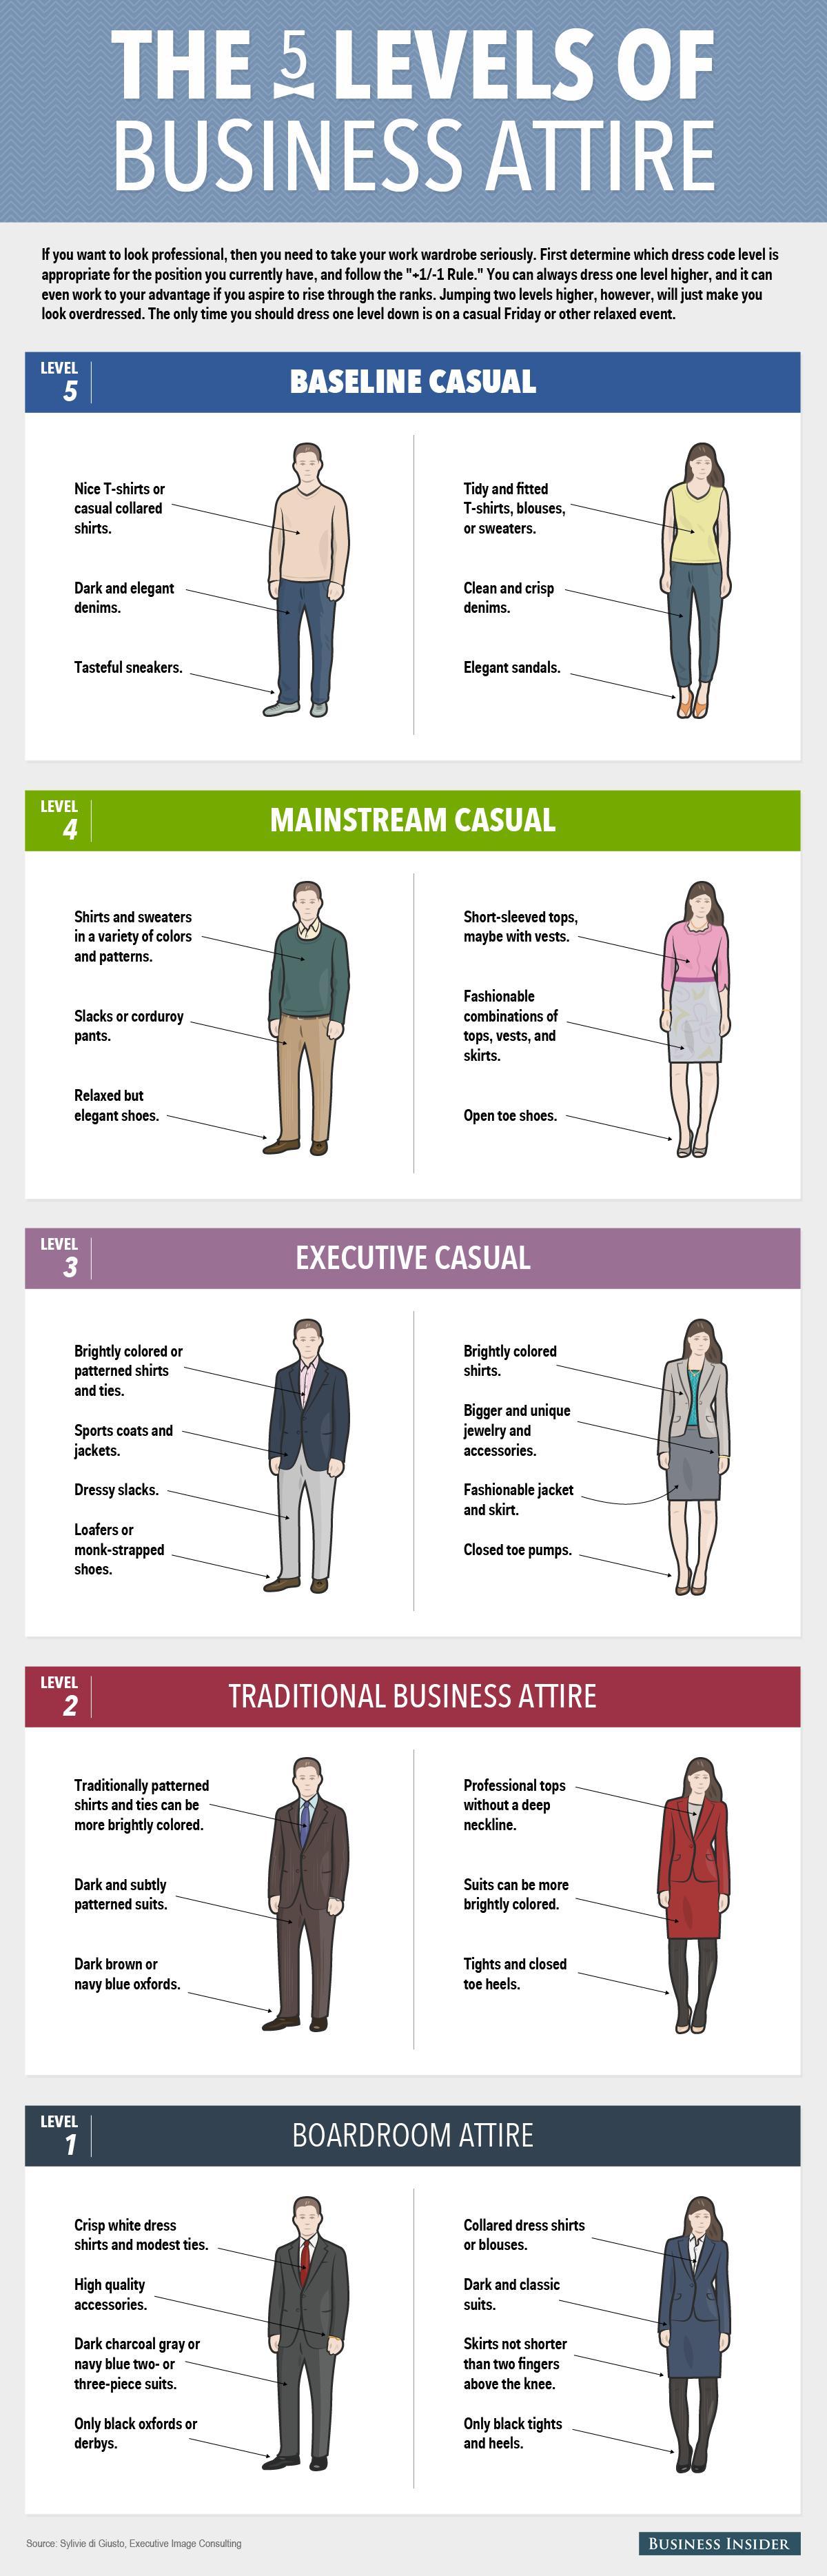 The 5 Levels Business Attire